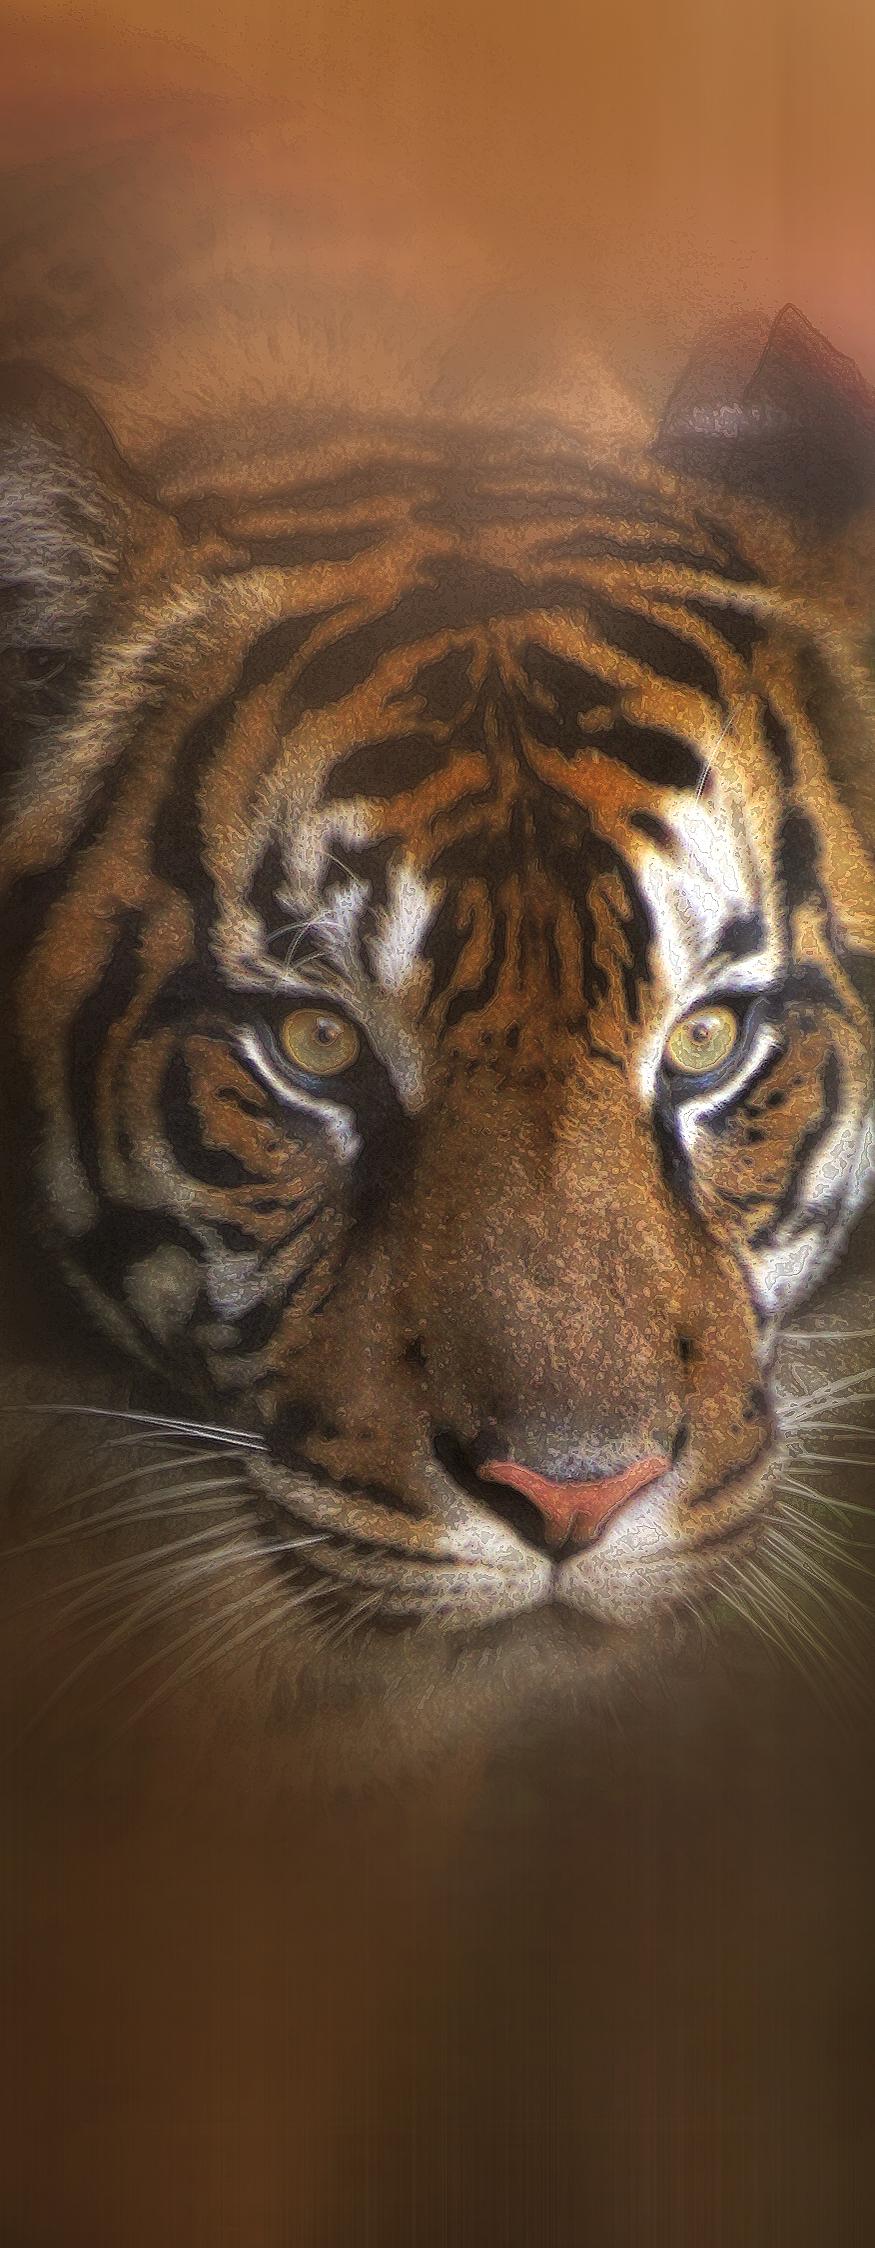 tiger head portrait right 3.jpg